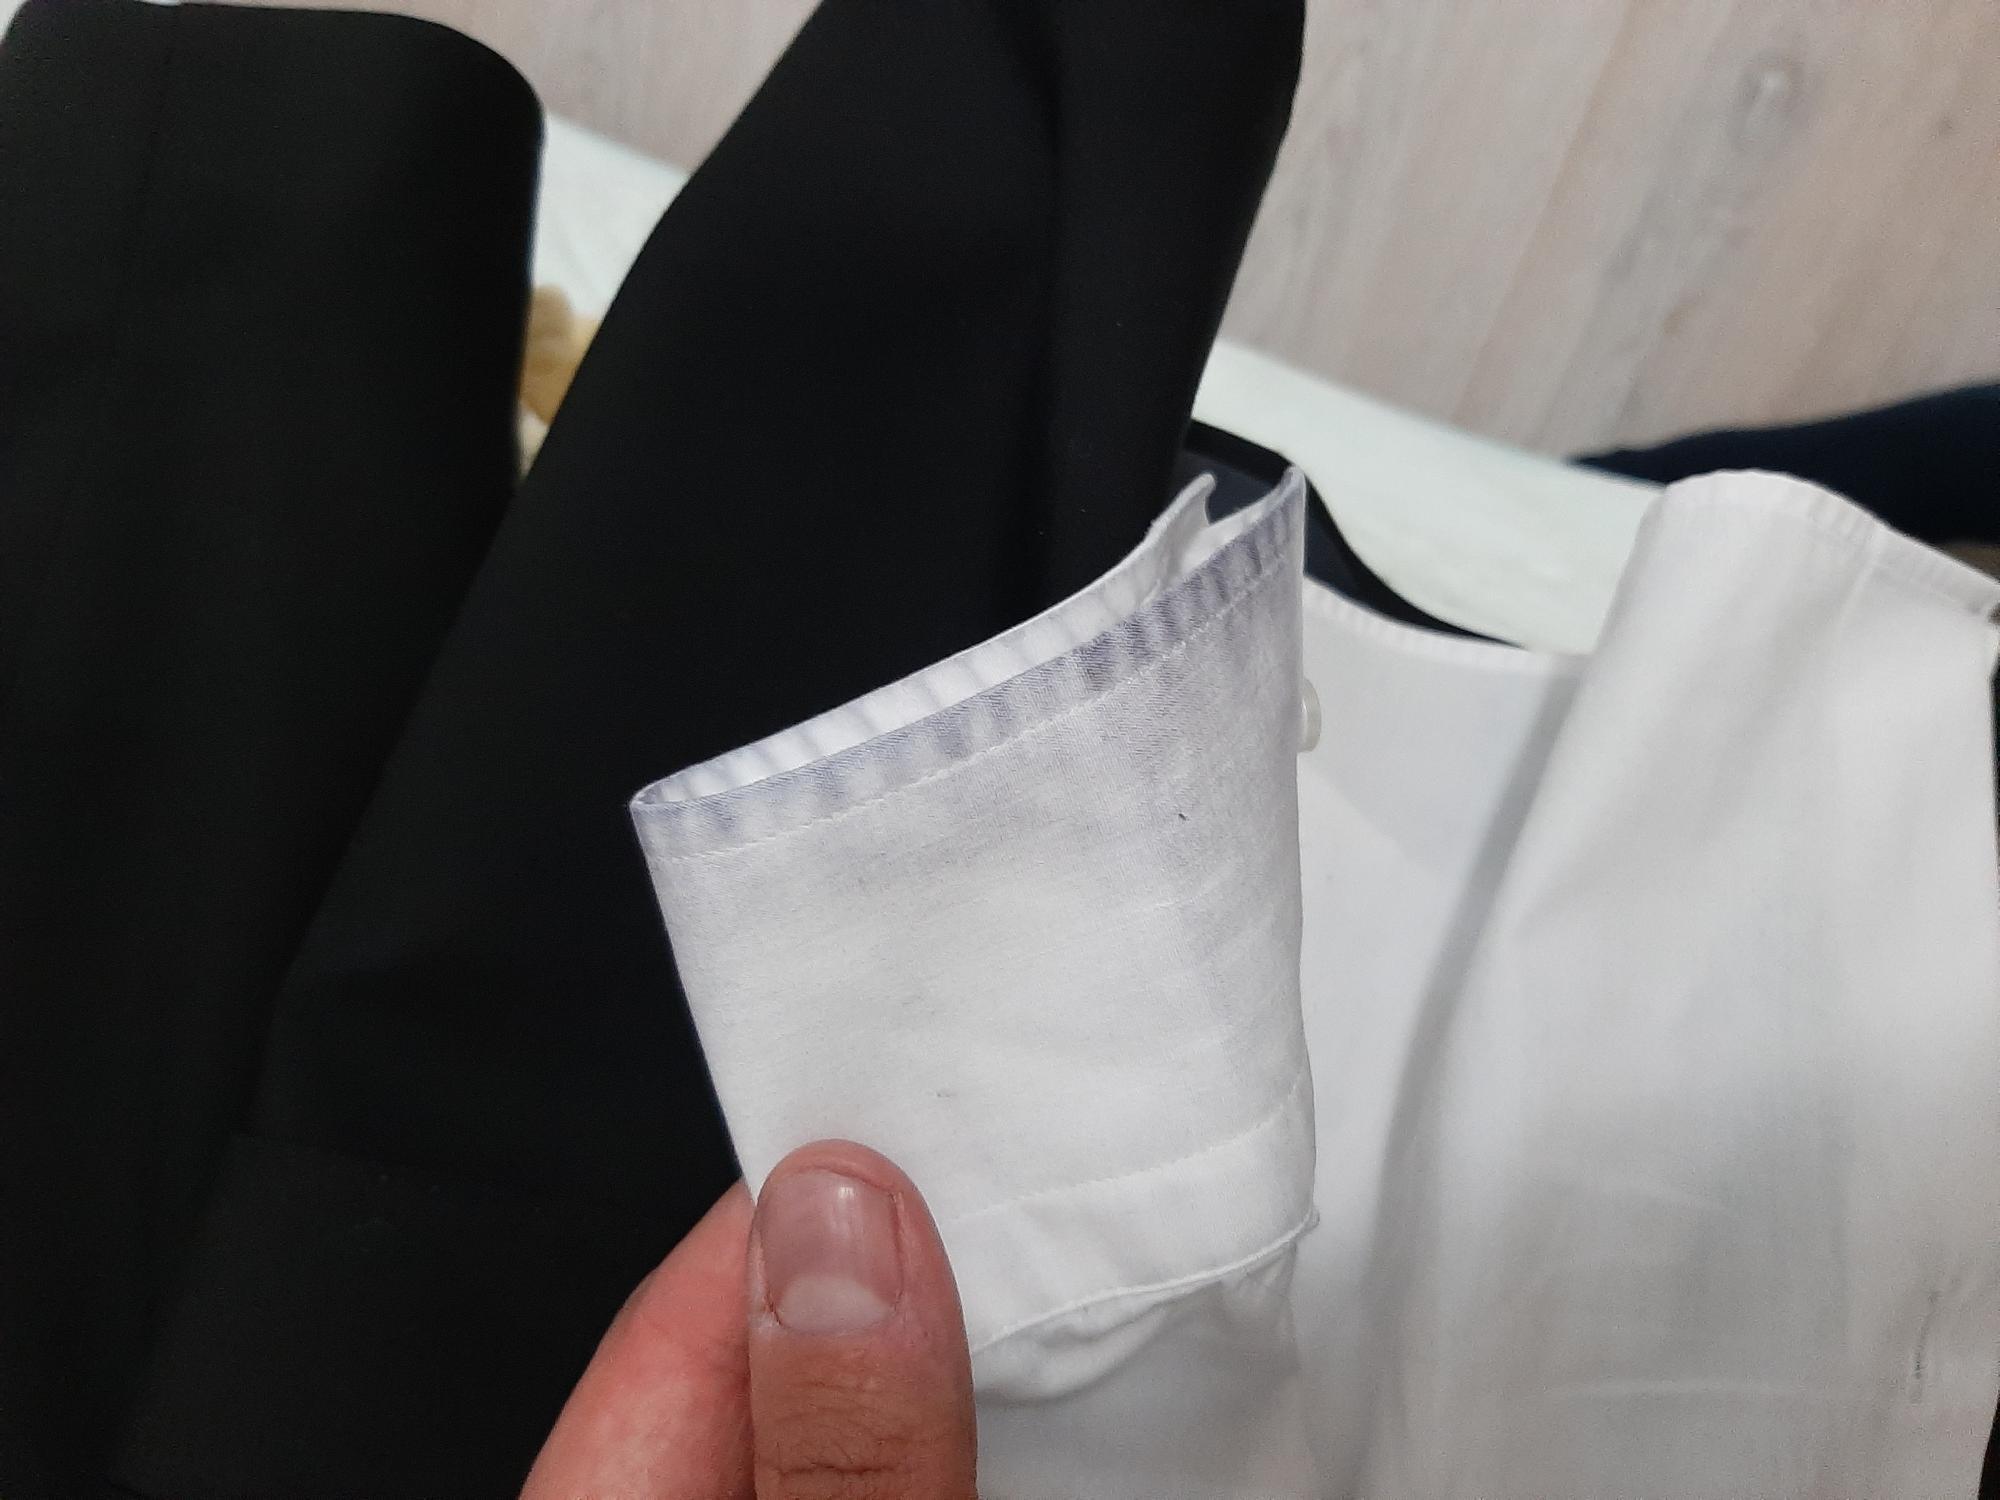 Kigili Giyim Takim Elbise Sikayetleri Sikayetvar